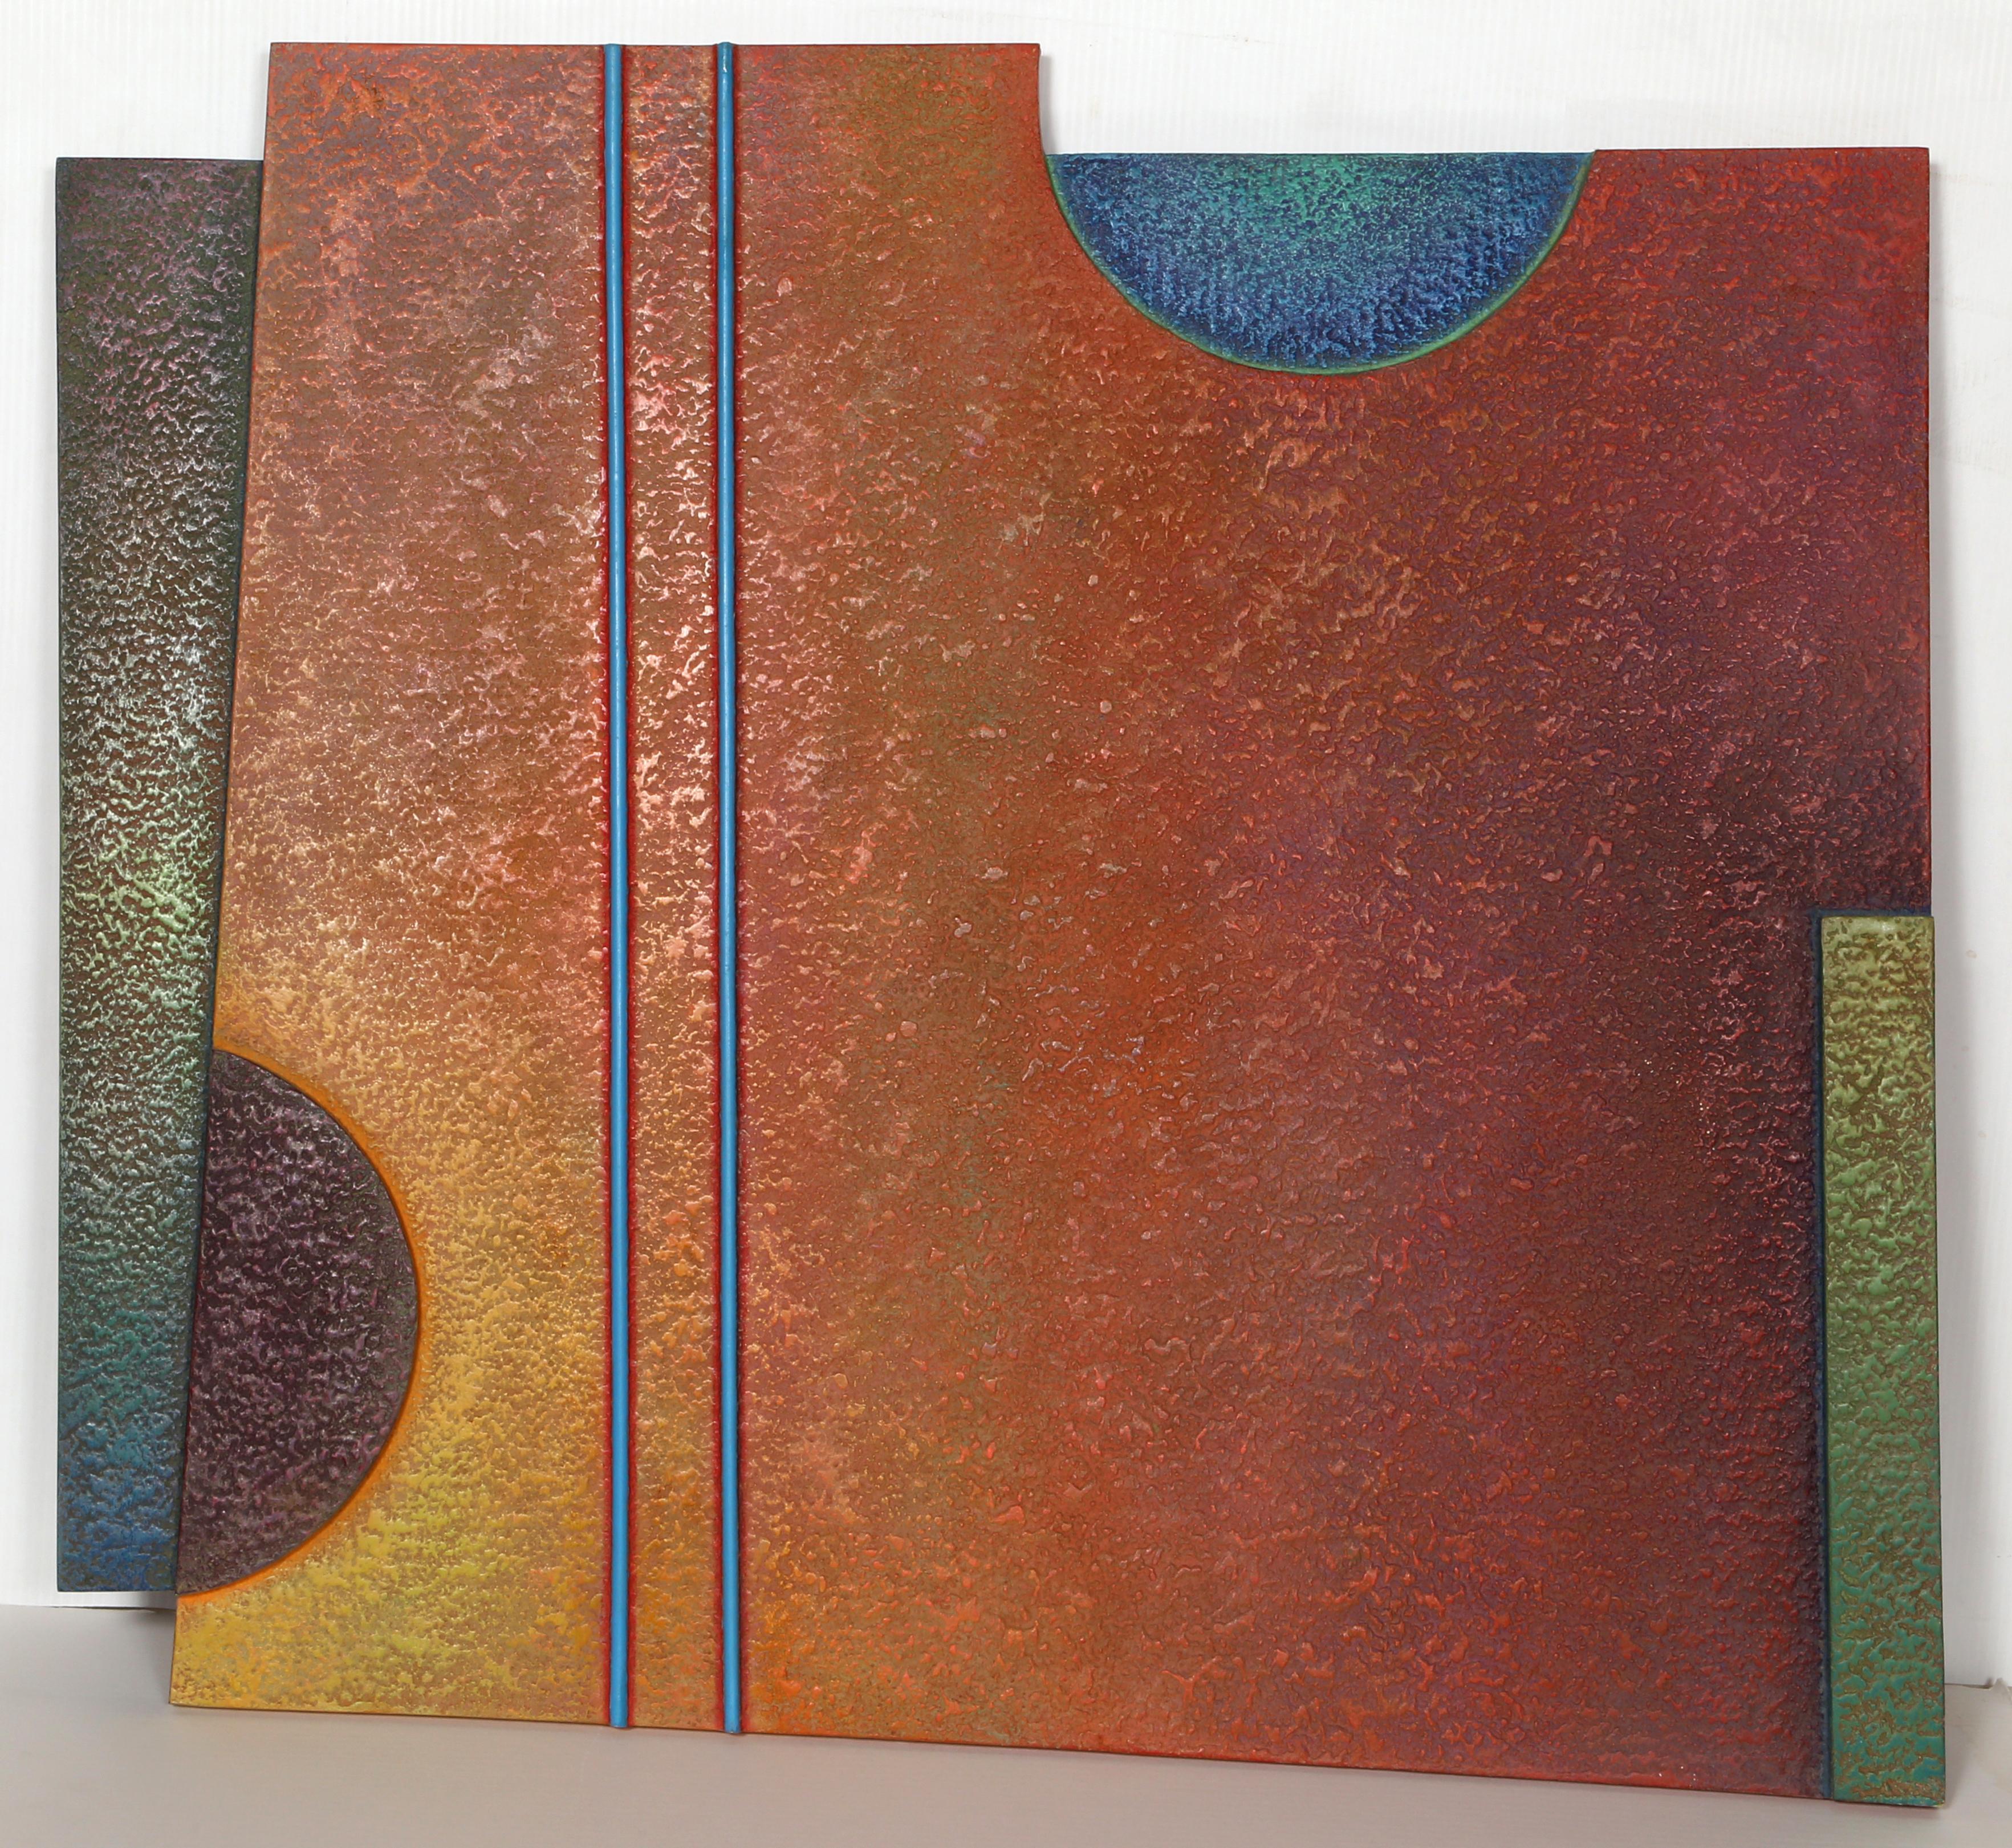 Zebuwl 2, Abstract Oil on Masonite by Warren Wolf